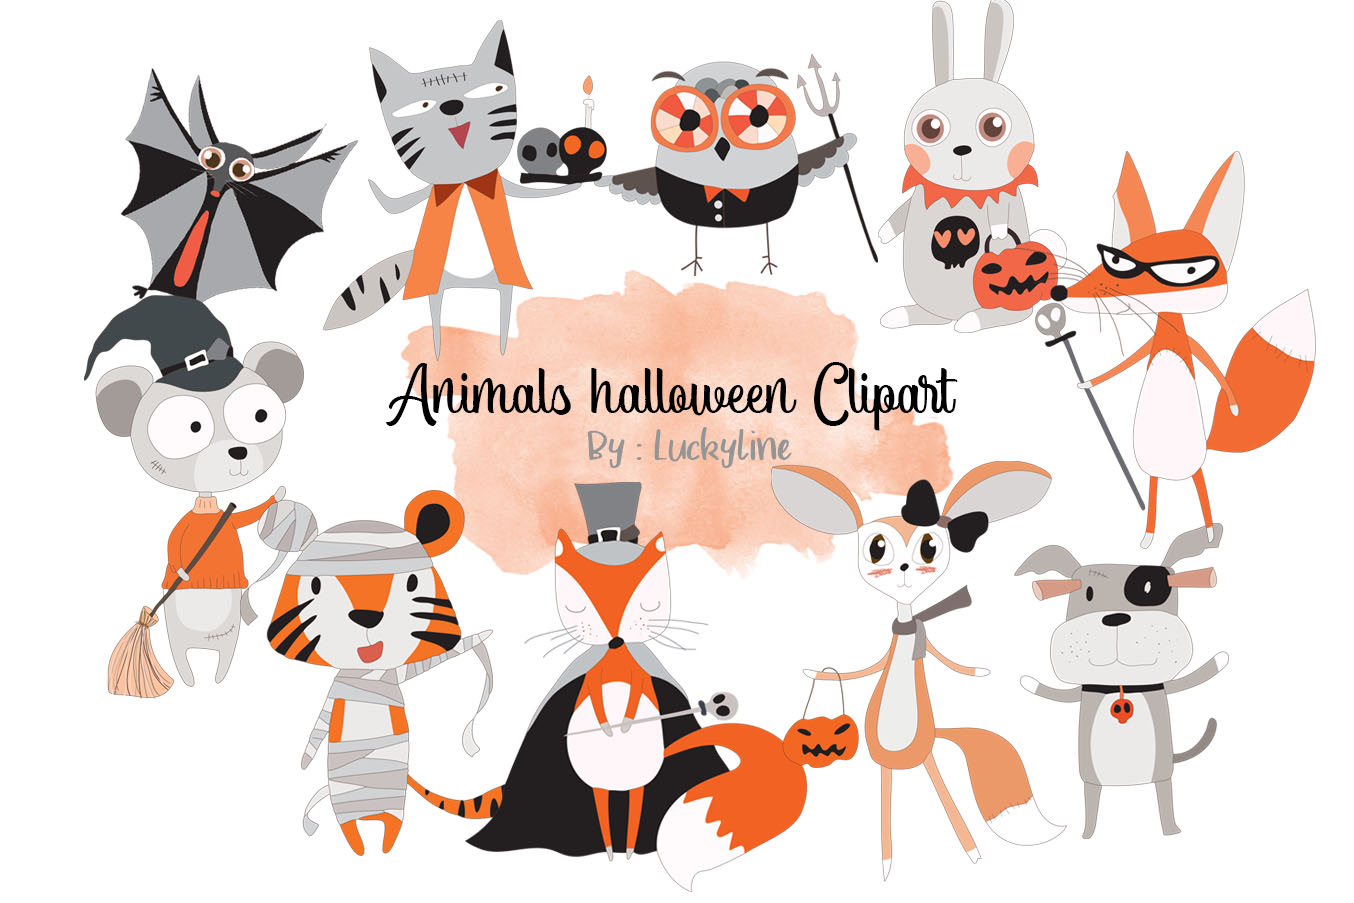 Animals Halloween clipart example image 1